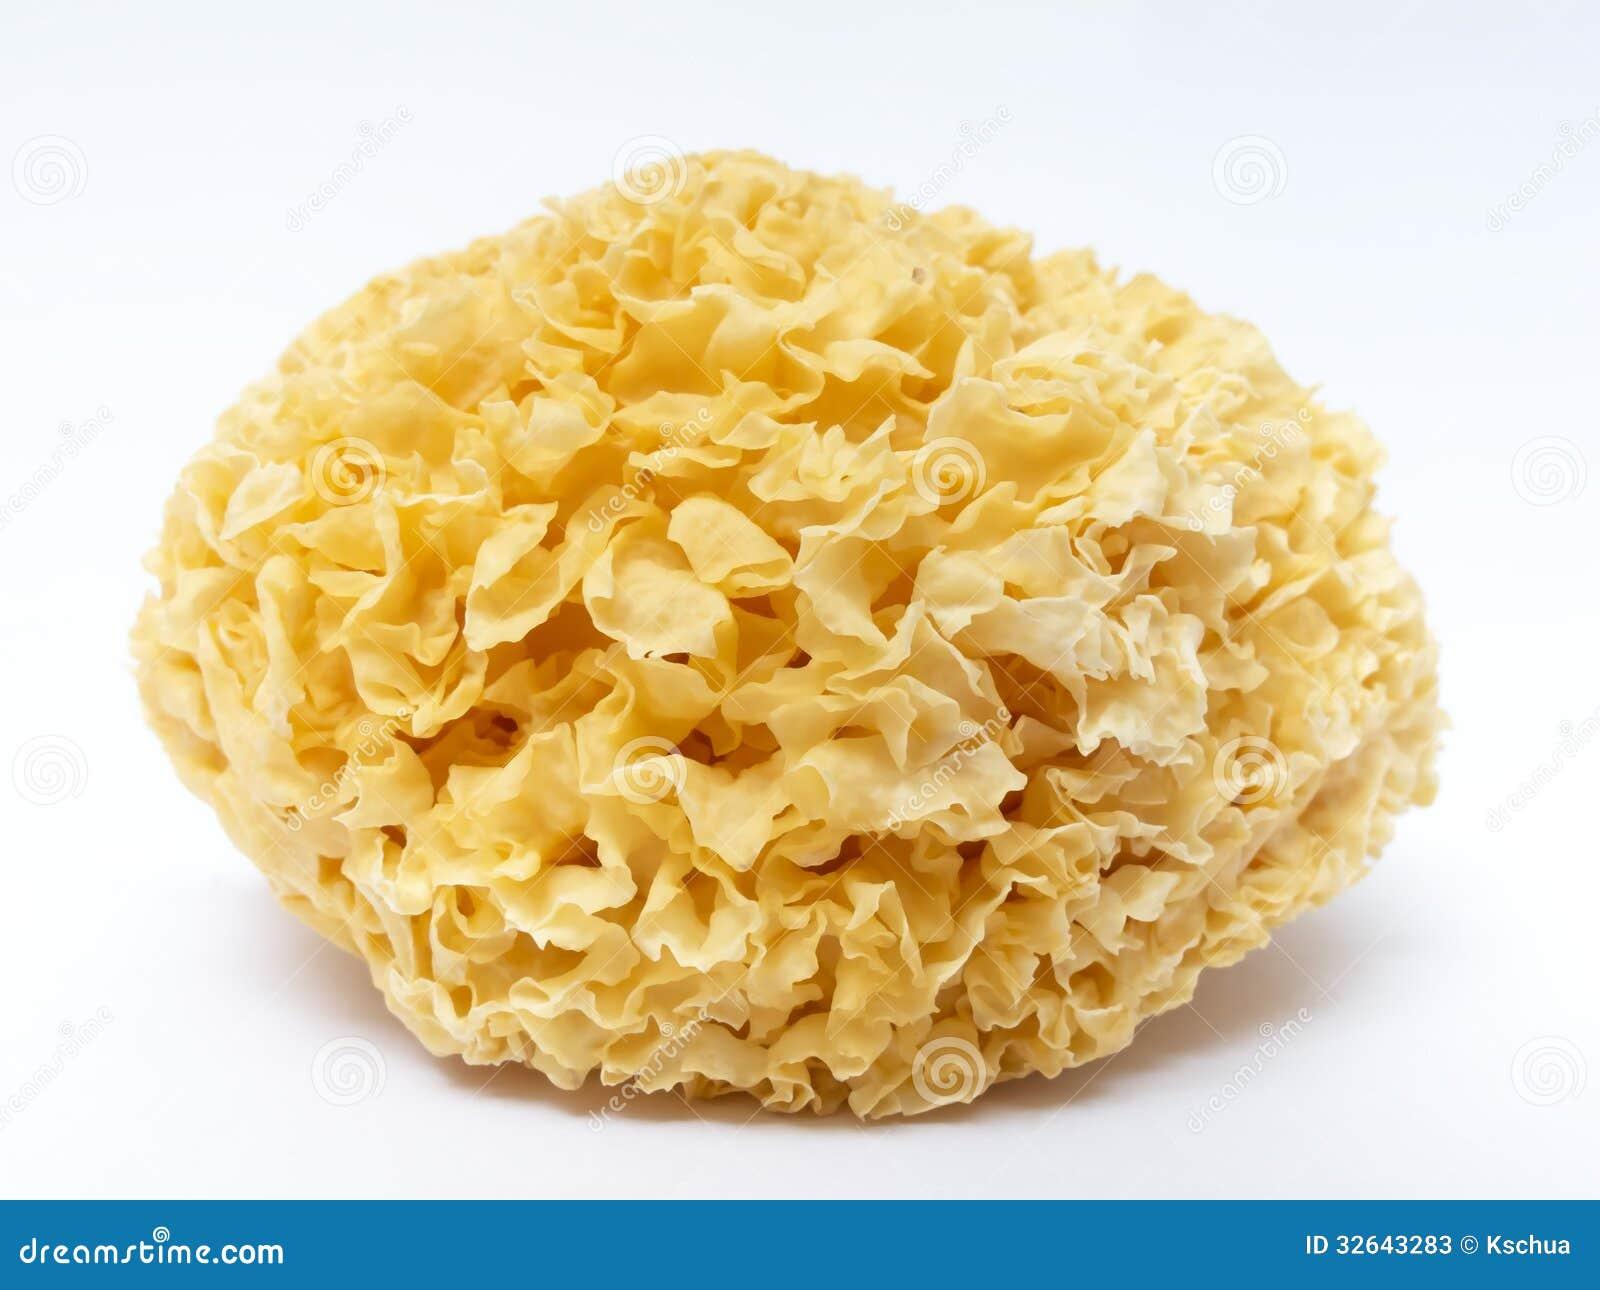 Edible white fungus stock image image of herb gourmet for Ayurvedic healing cuisine